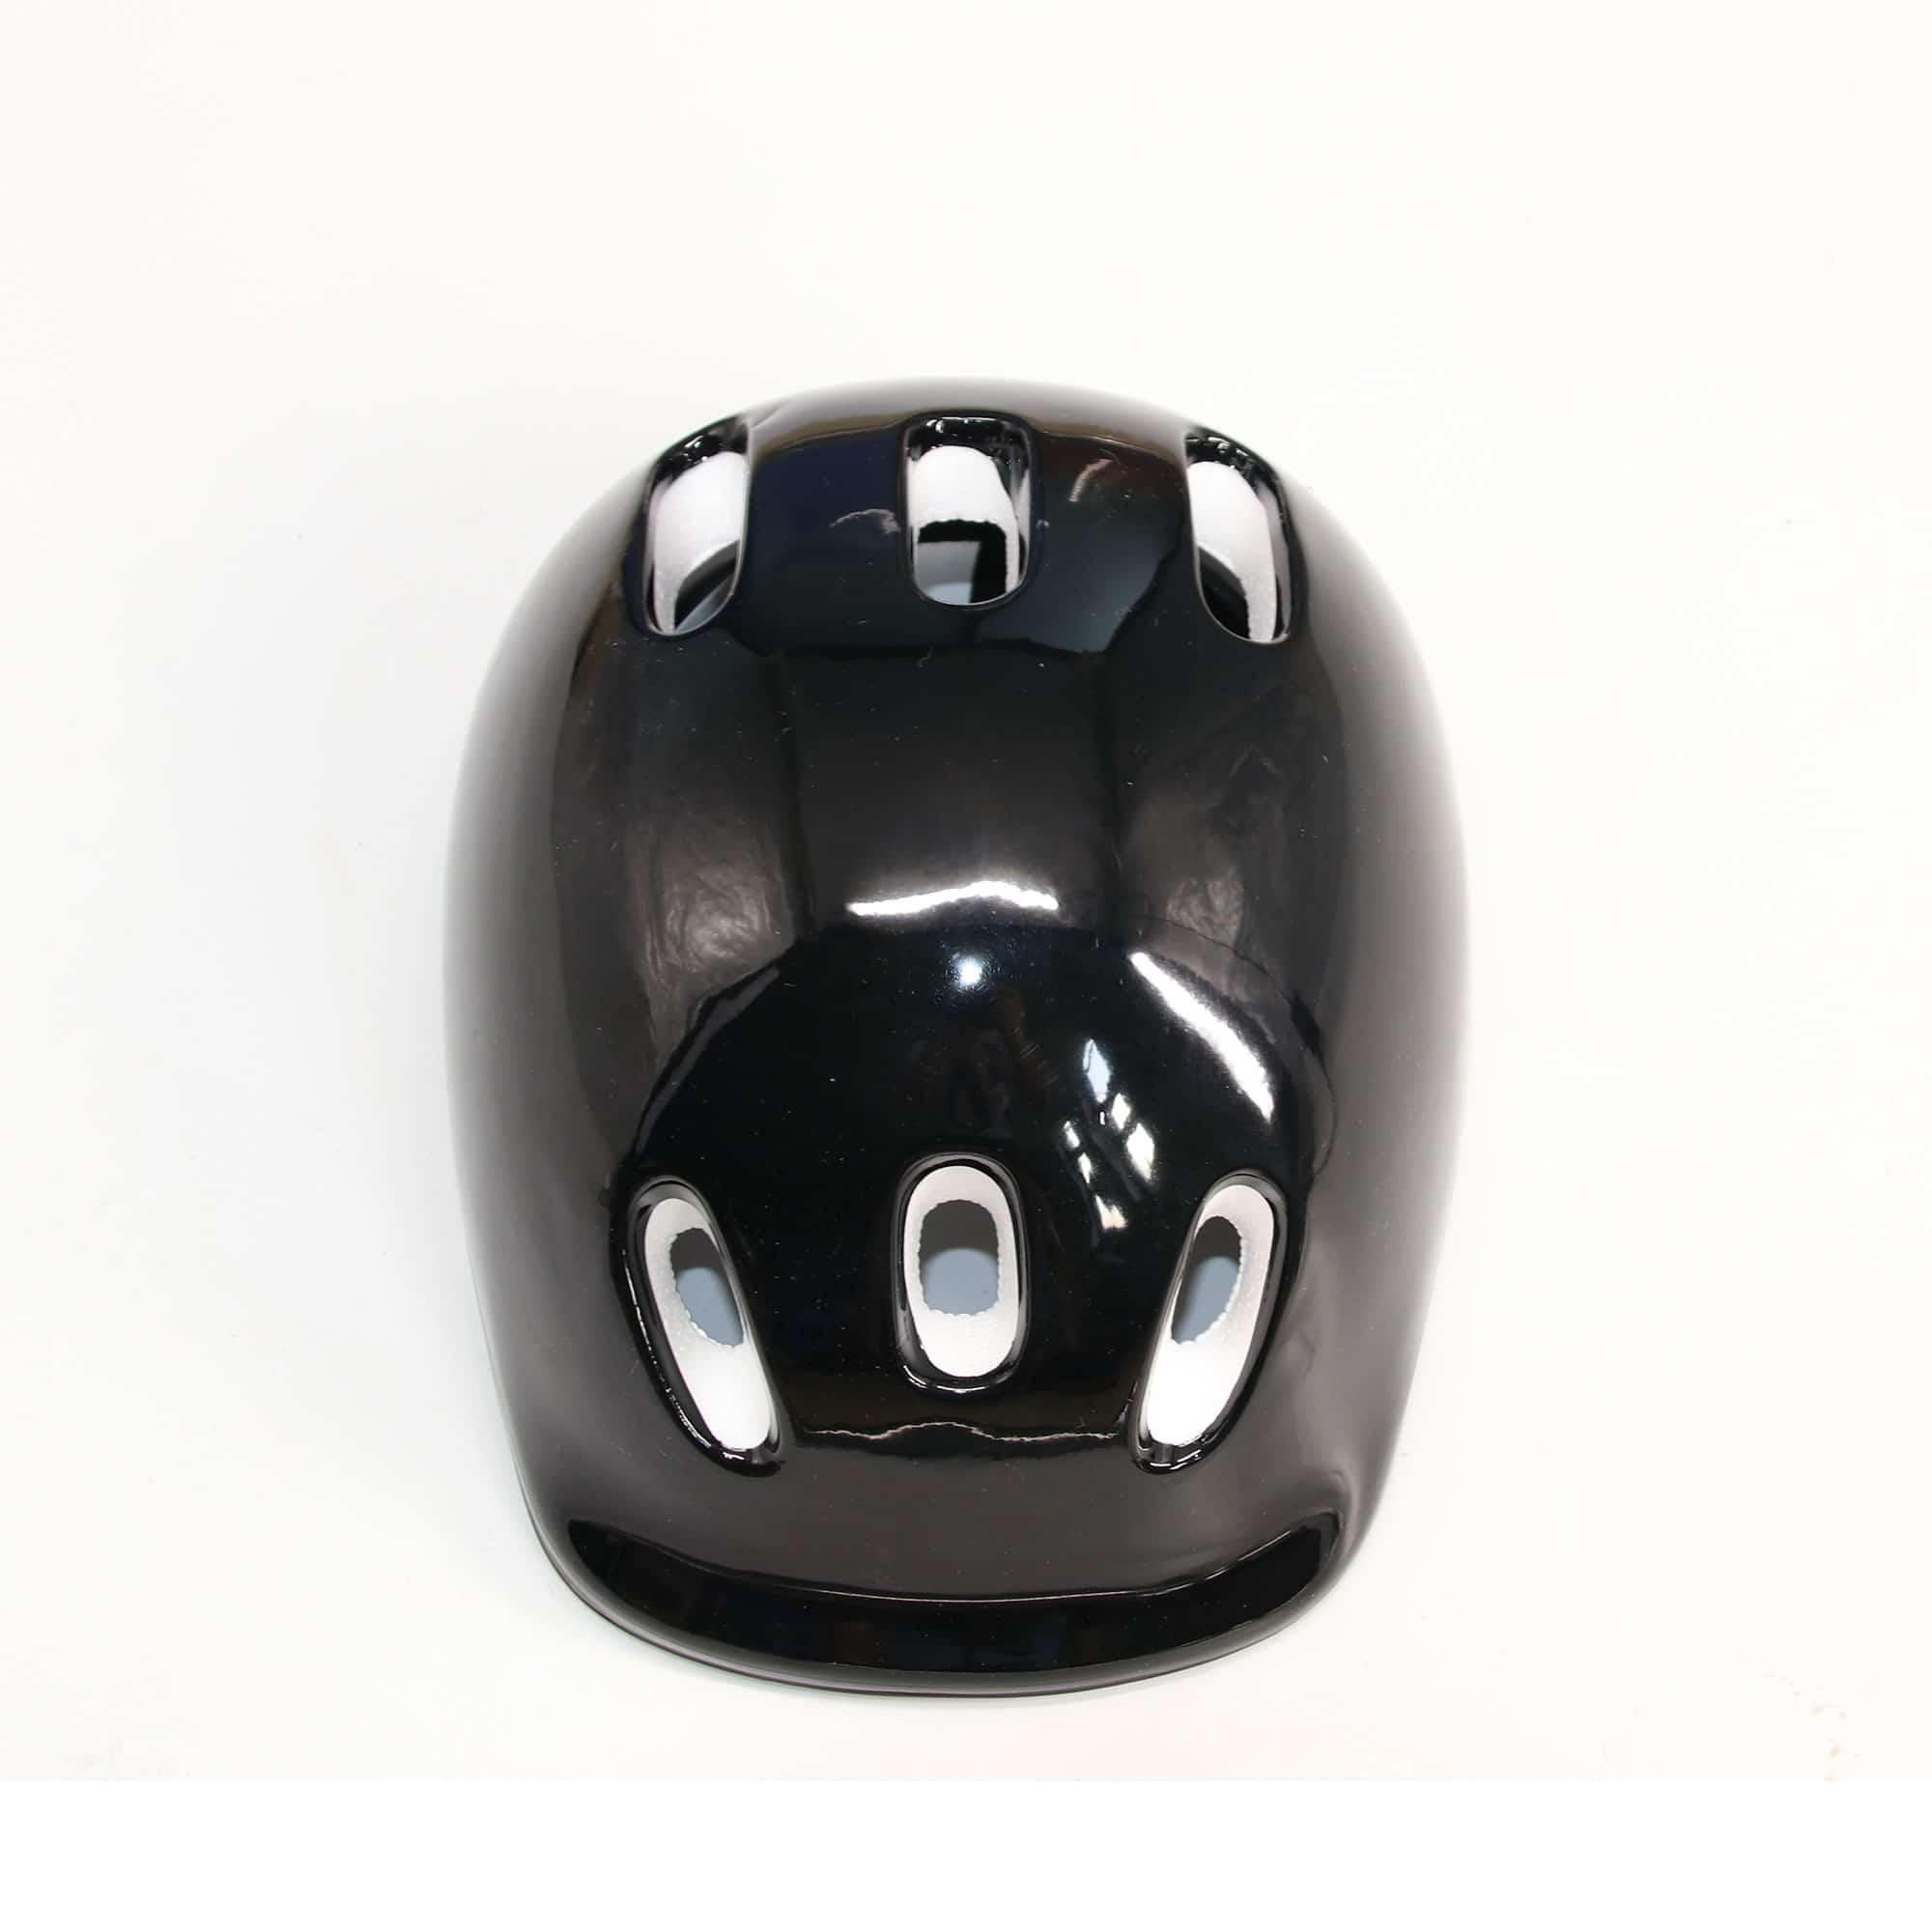 casco para patinete eléctrico - Zwheel